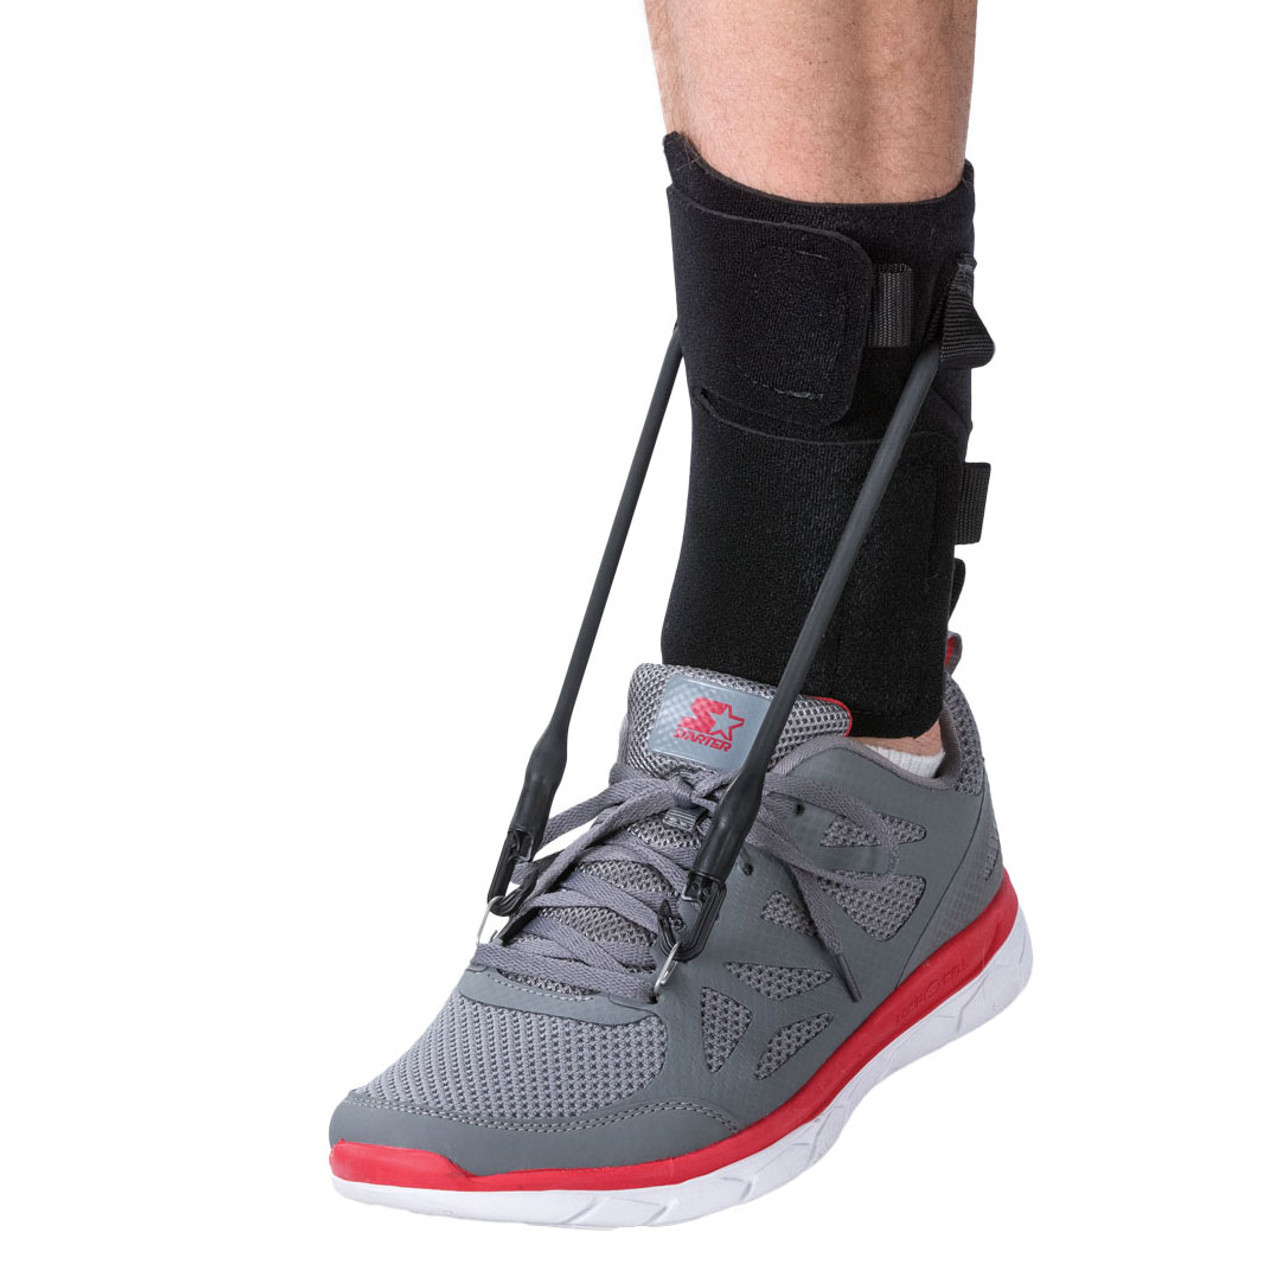 22c3e10e13c FootFlexor Ankle Foot Orthosis | Braces & Supports | Vitality Depot